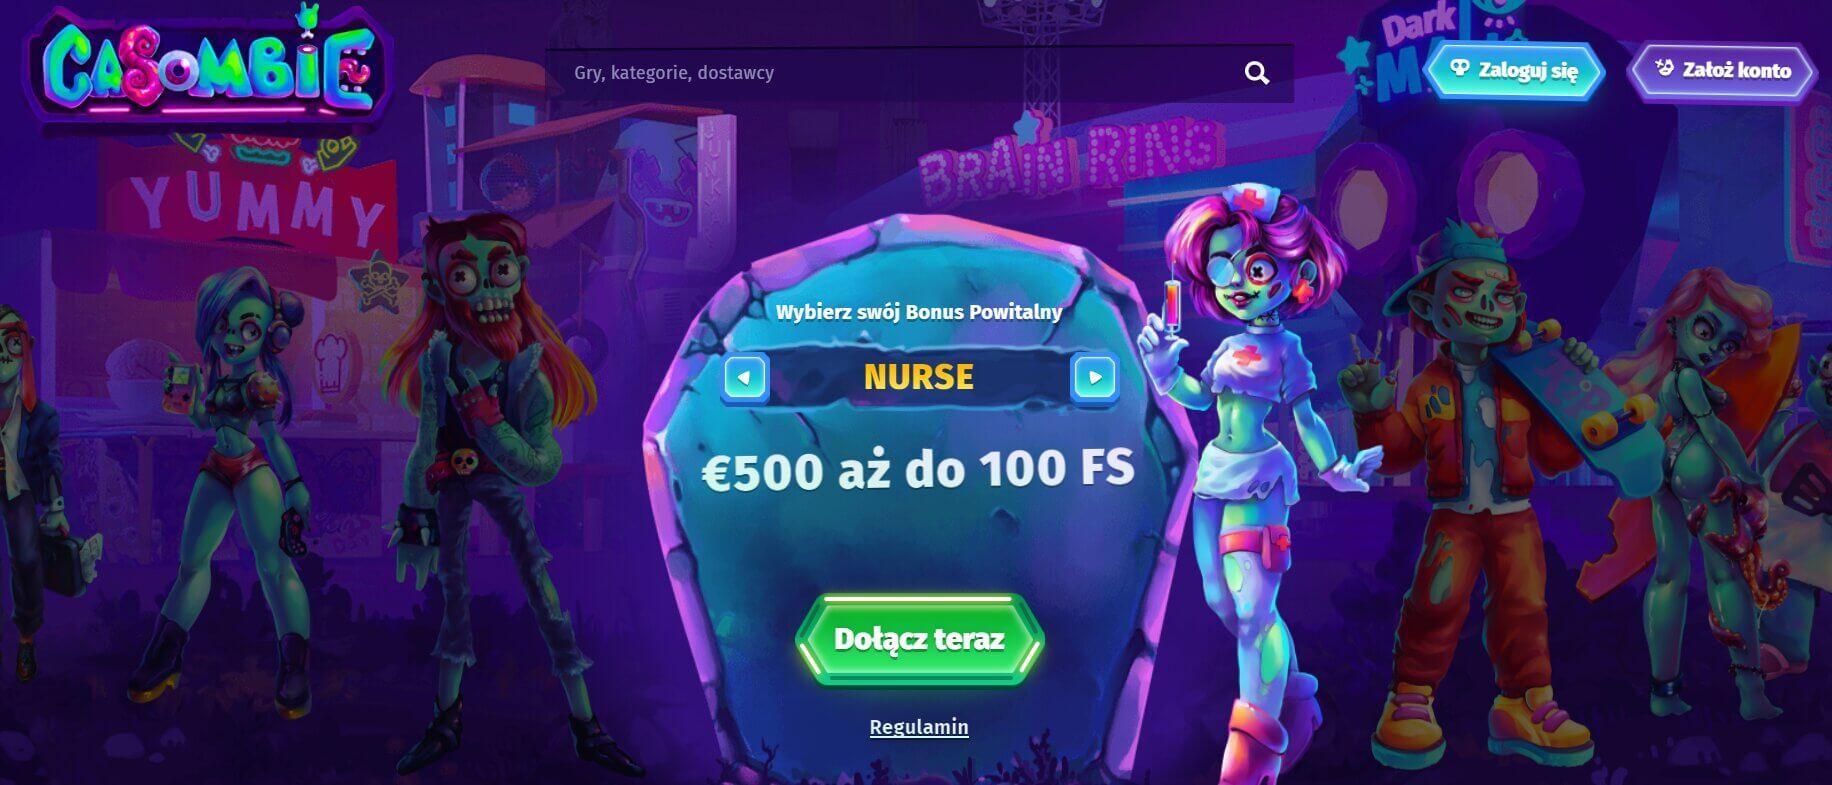 bonus powitalny w casombie casino screenshot